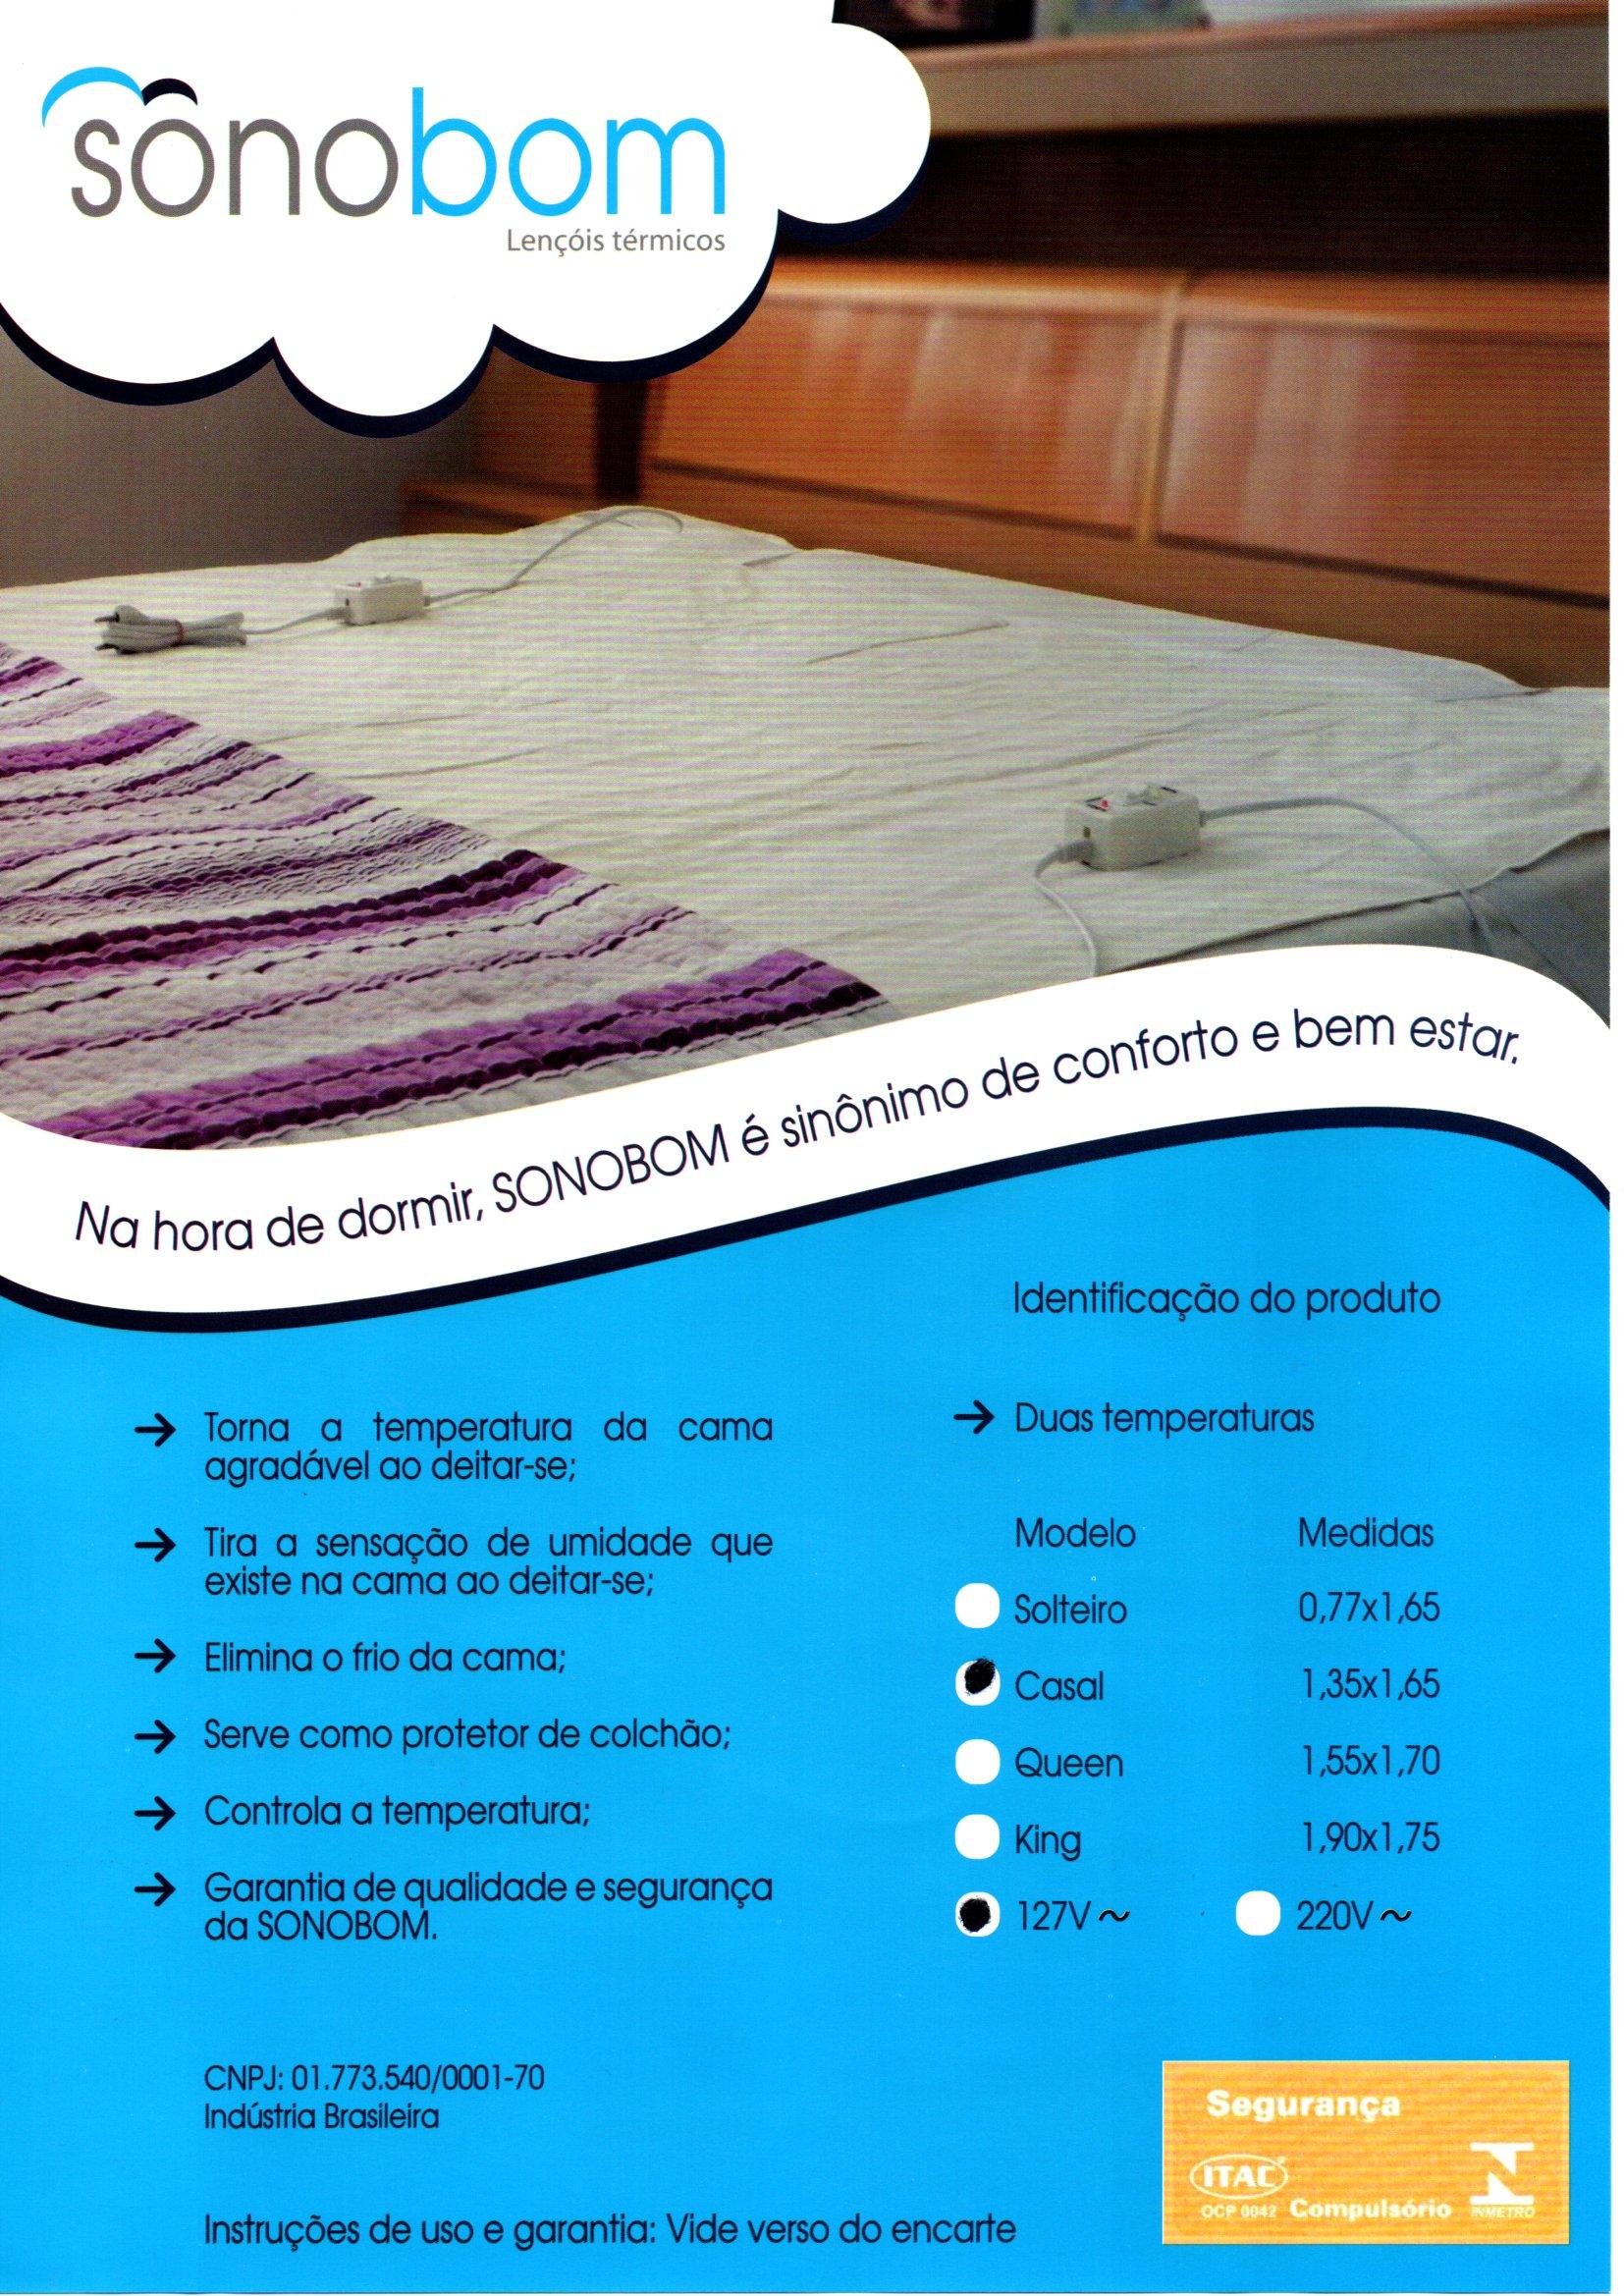 Polisani Materiais Médicos - LENCOL TERMICO KINGSIZE 1,70X1,90 220V SONOBOM